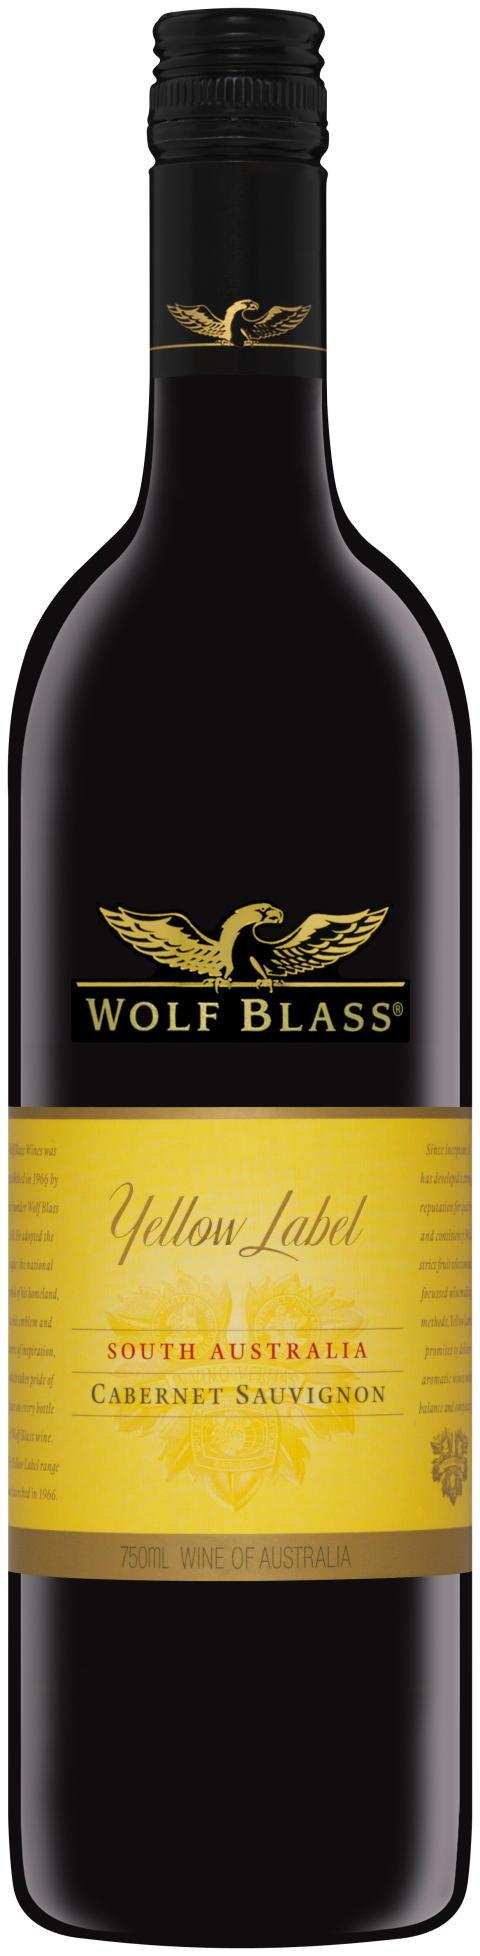 Wolf Blass Yellow Label